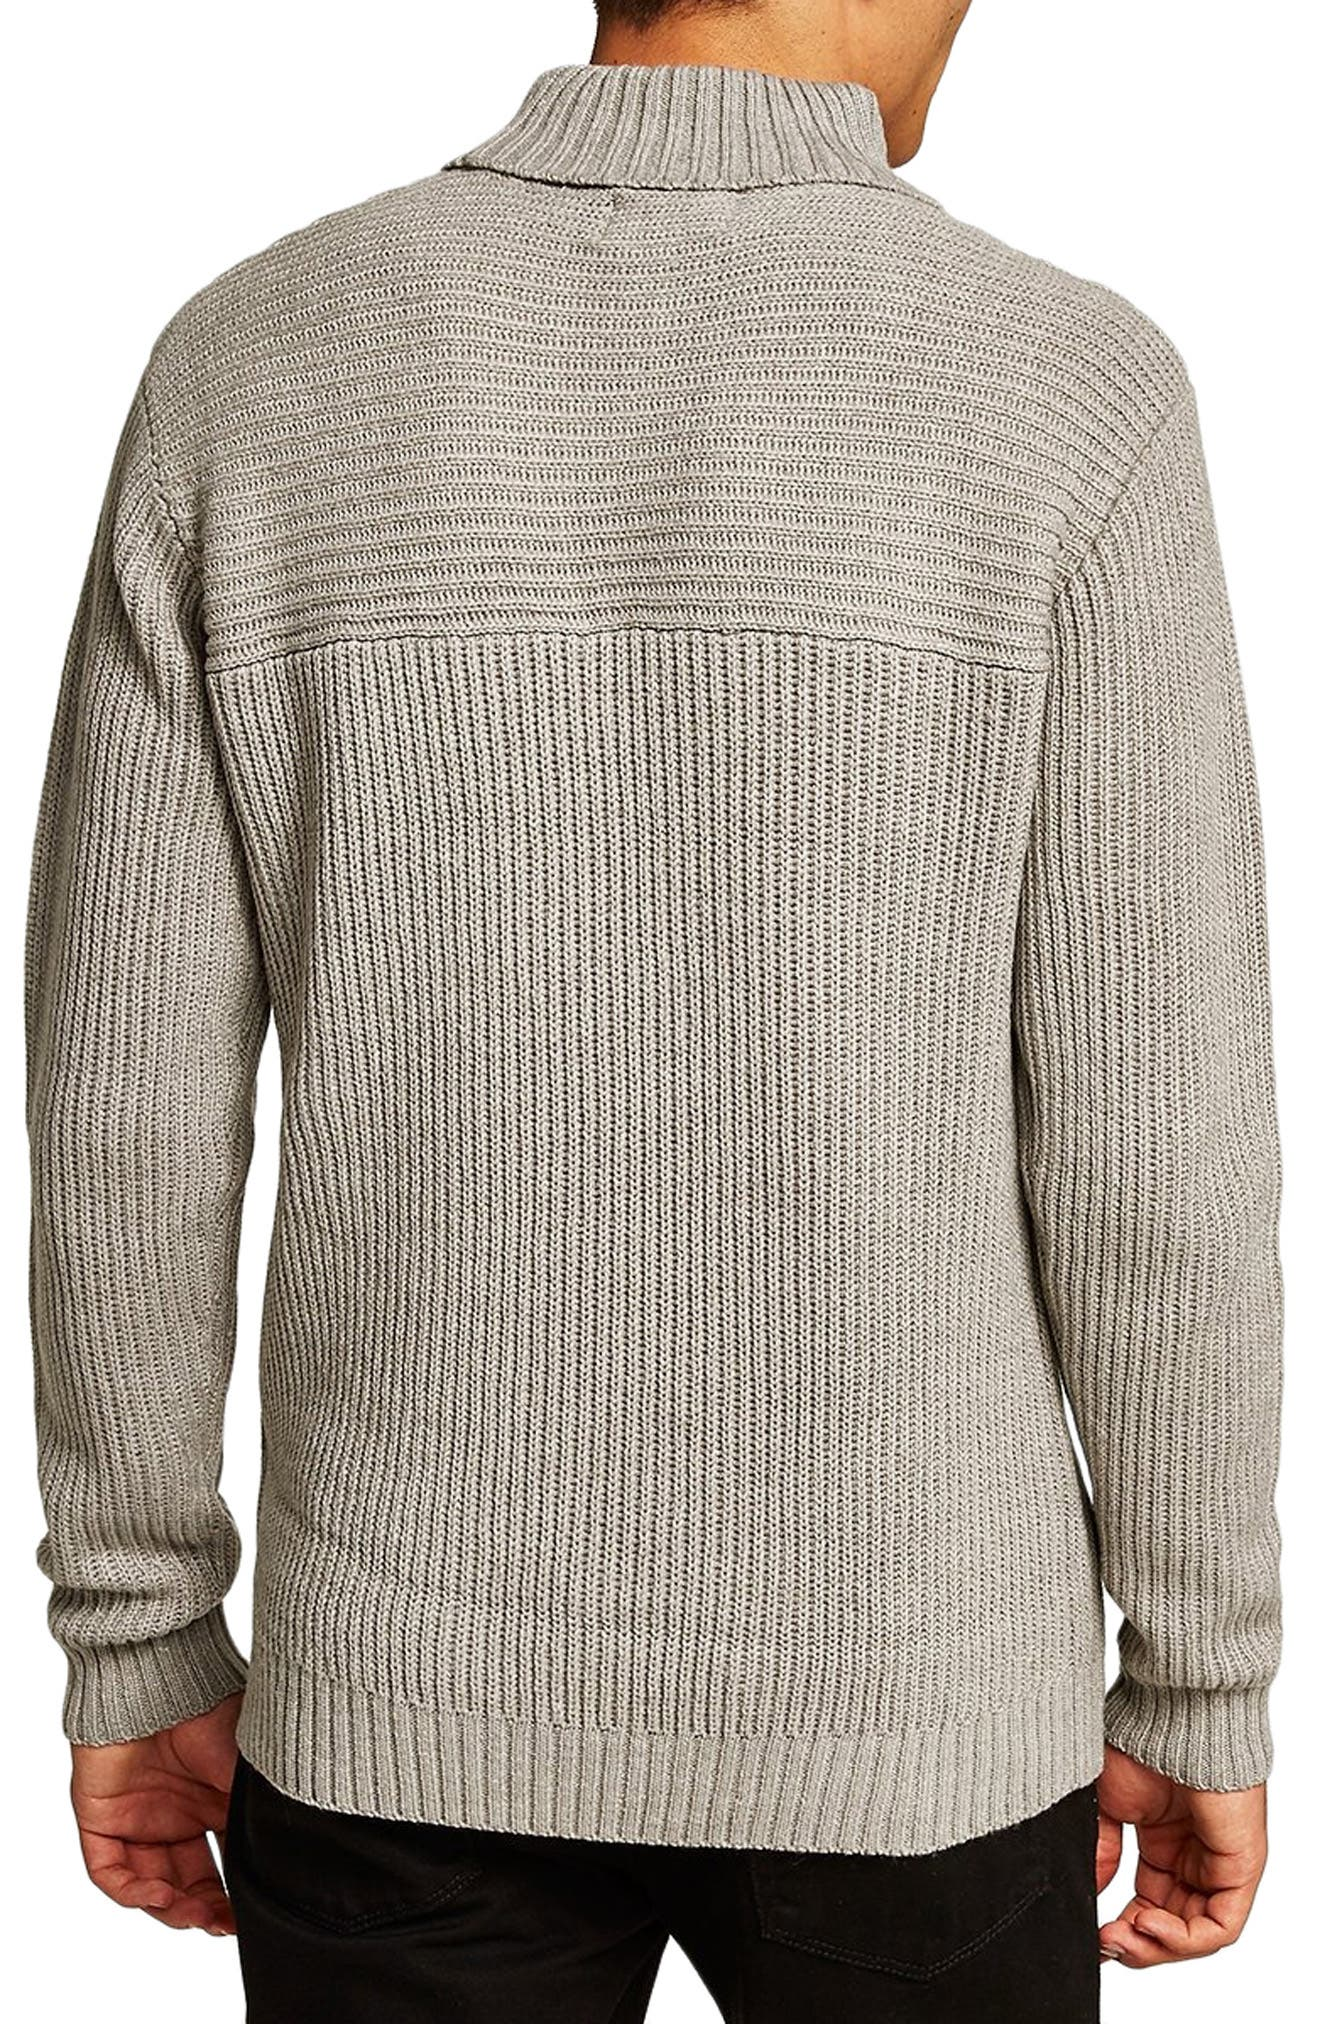 Flint Ribbed Turtleneck Sweater,                             Alternate thumbnail 2, color,                             020